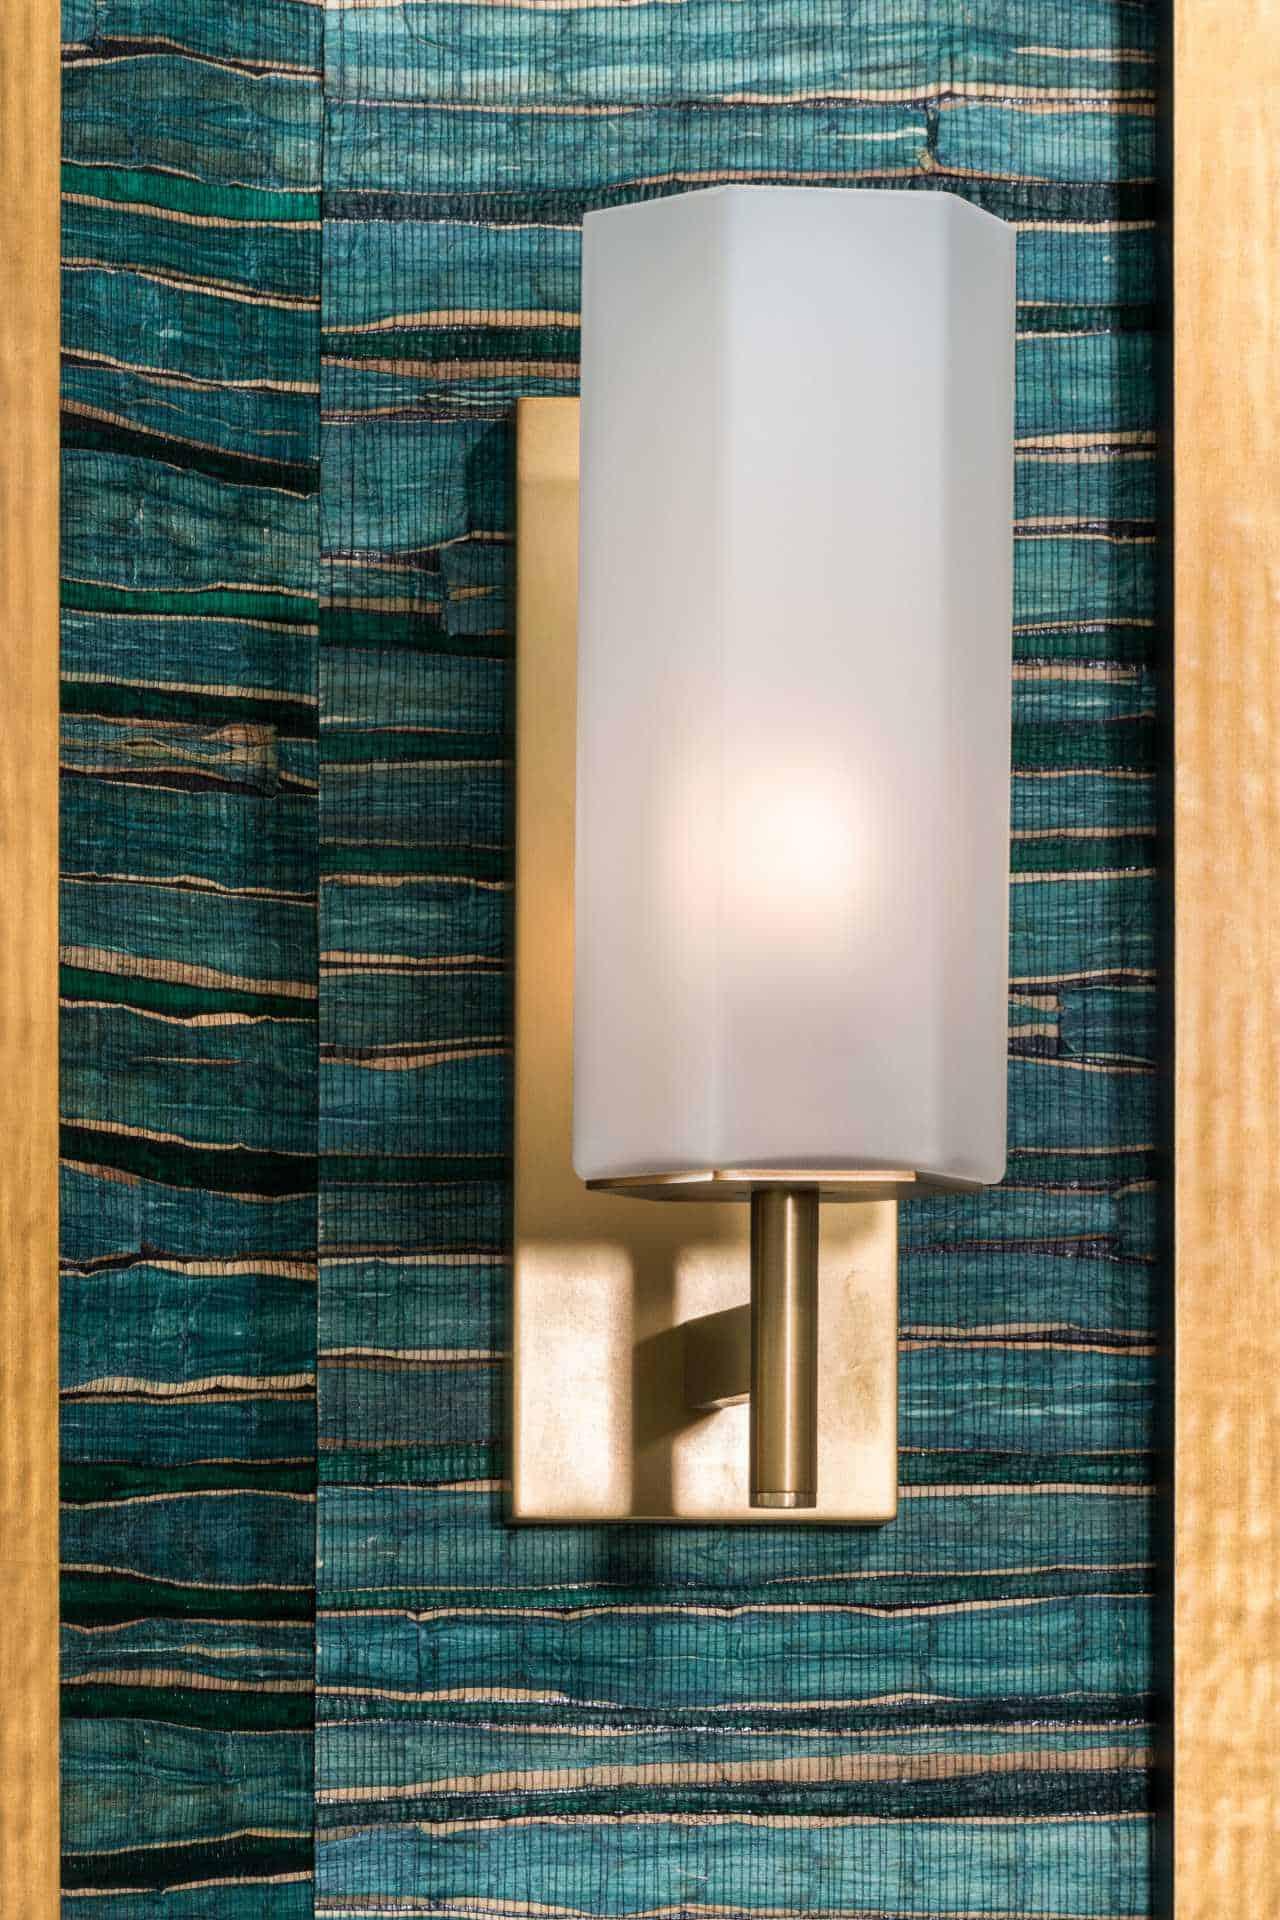 Ornate, wall-mounted bath lighting